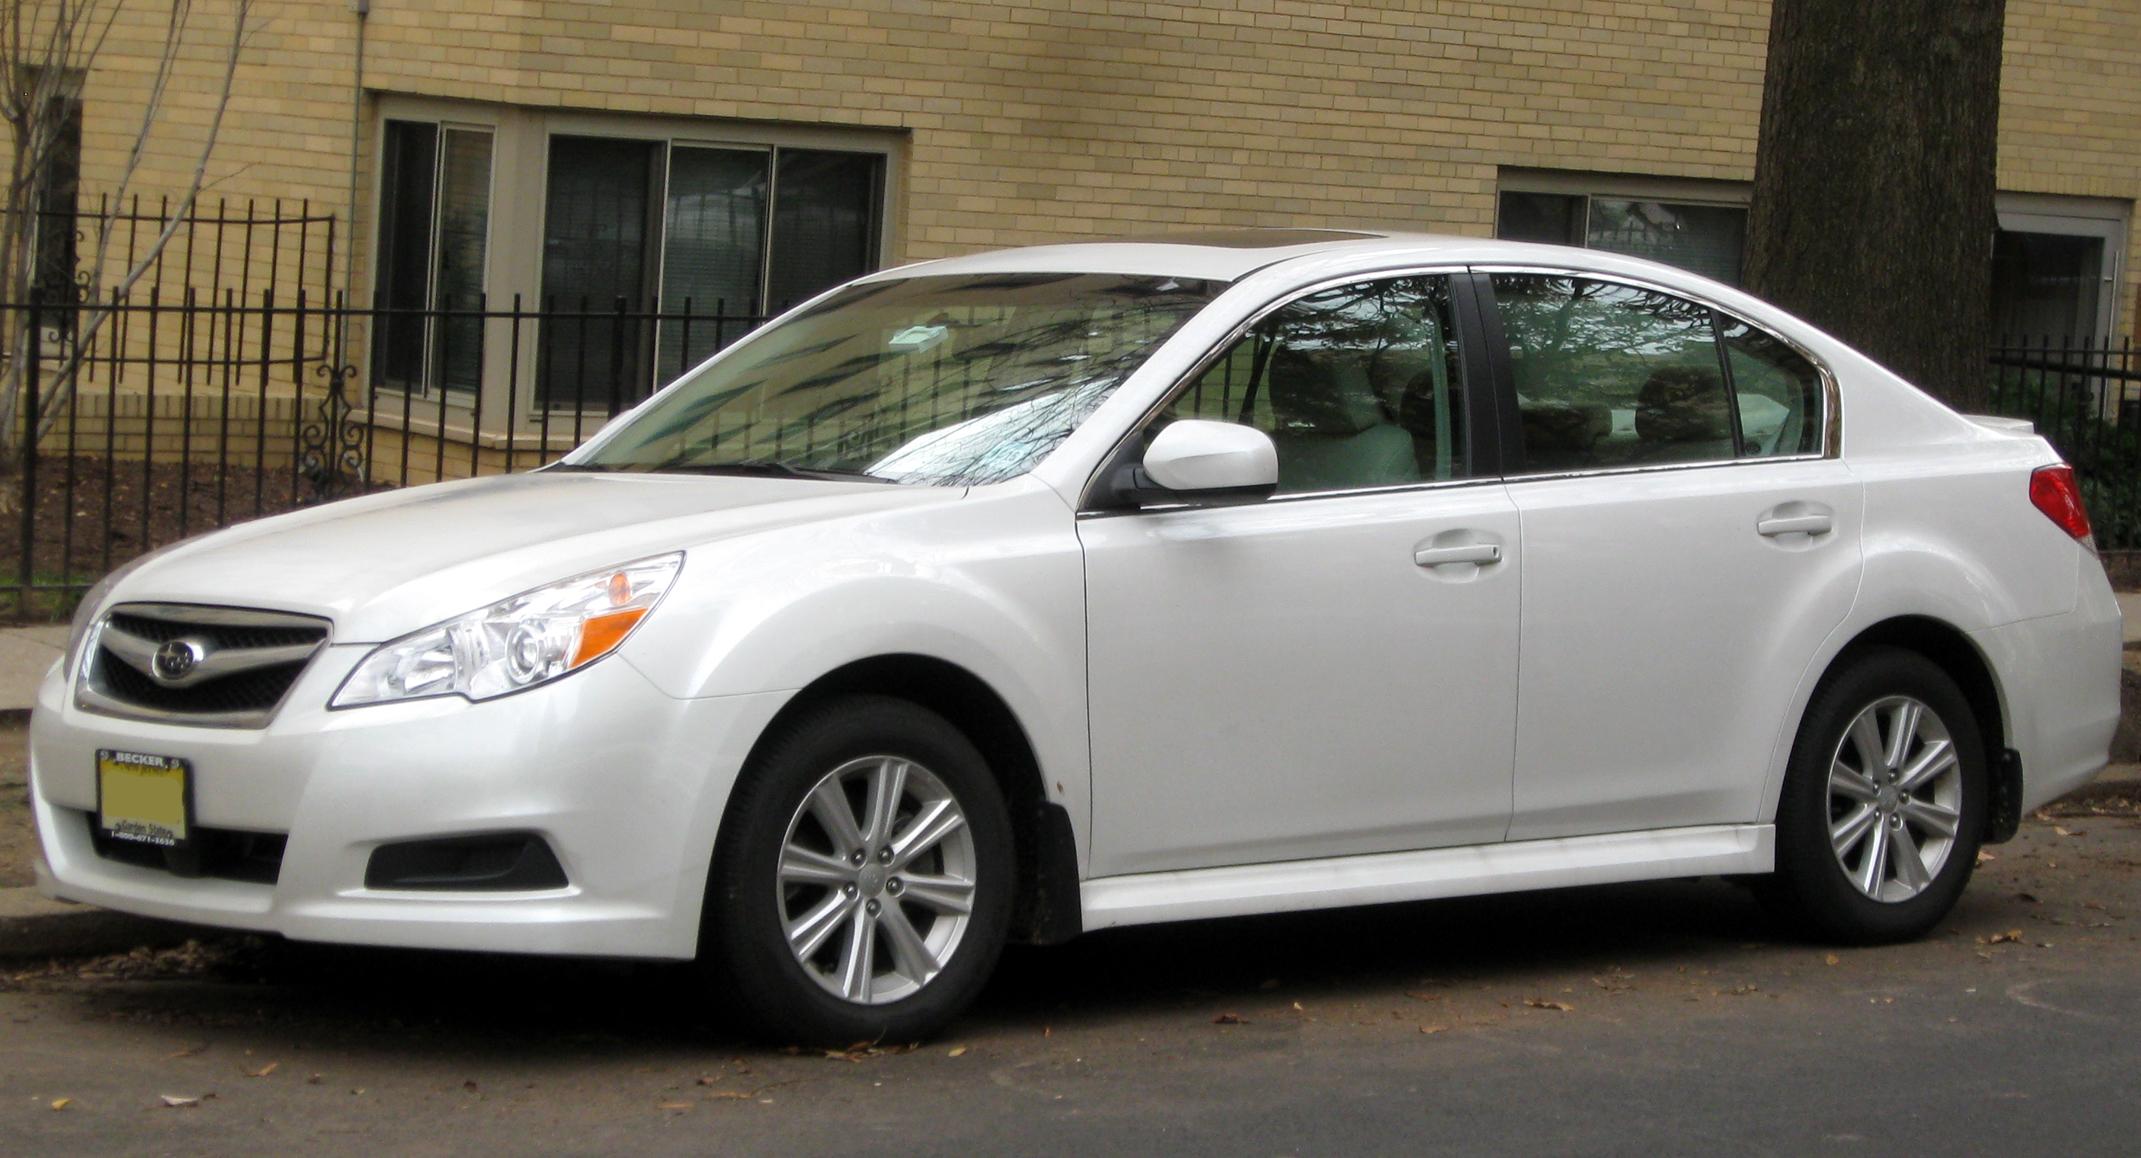 Subaru Legacy: 2.5 L turbo models